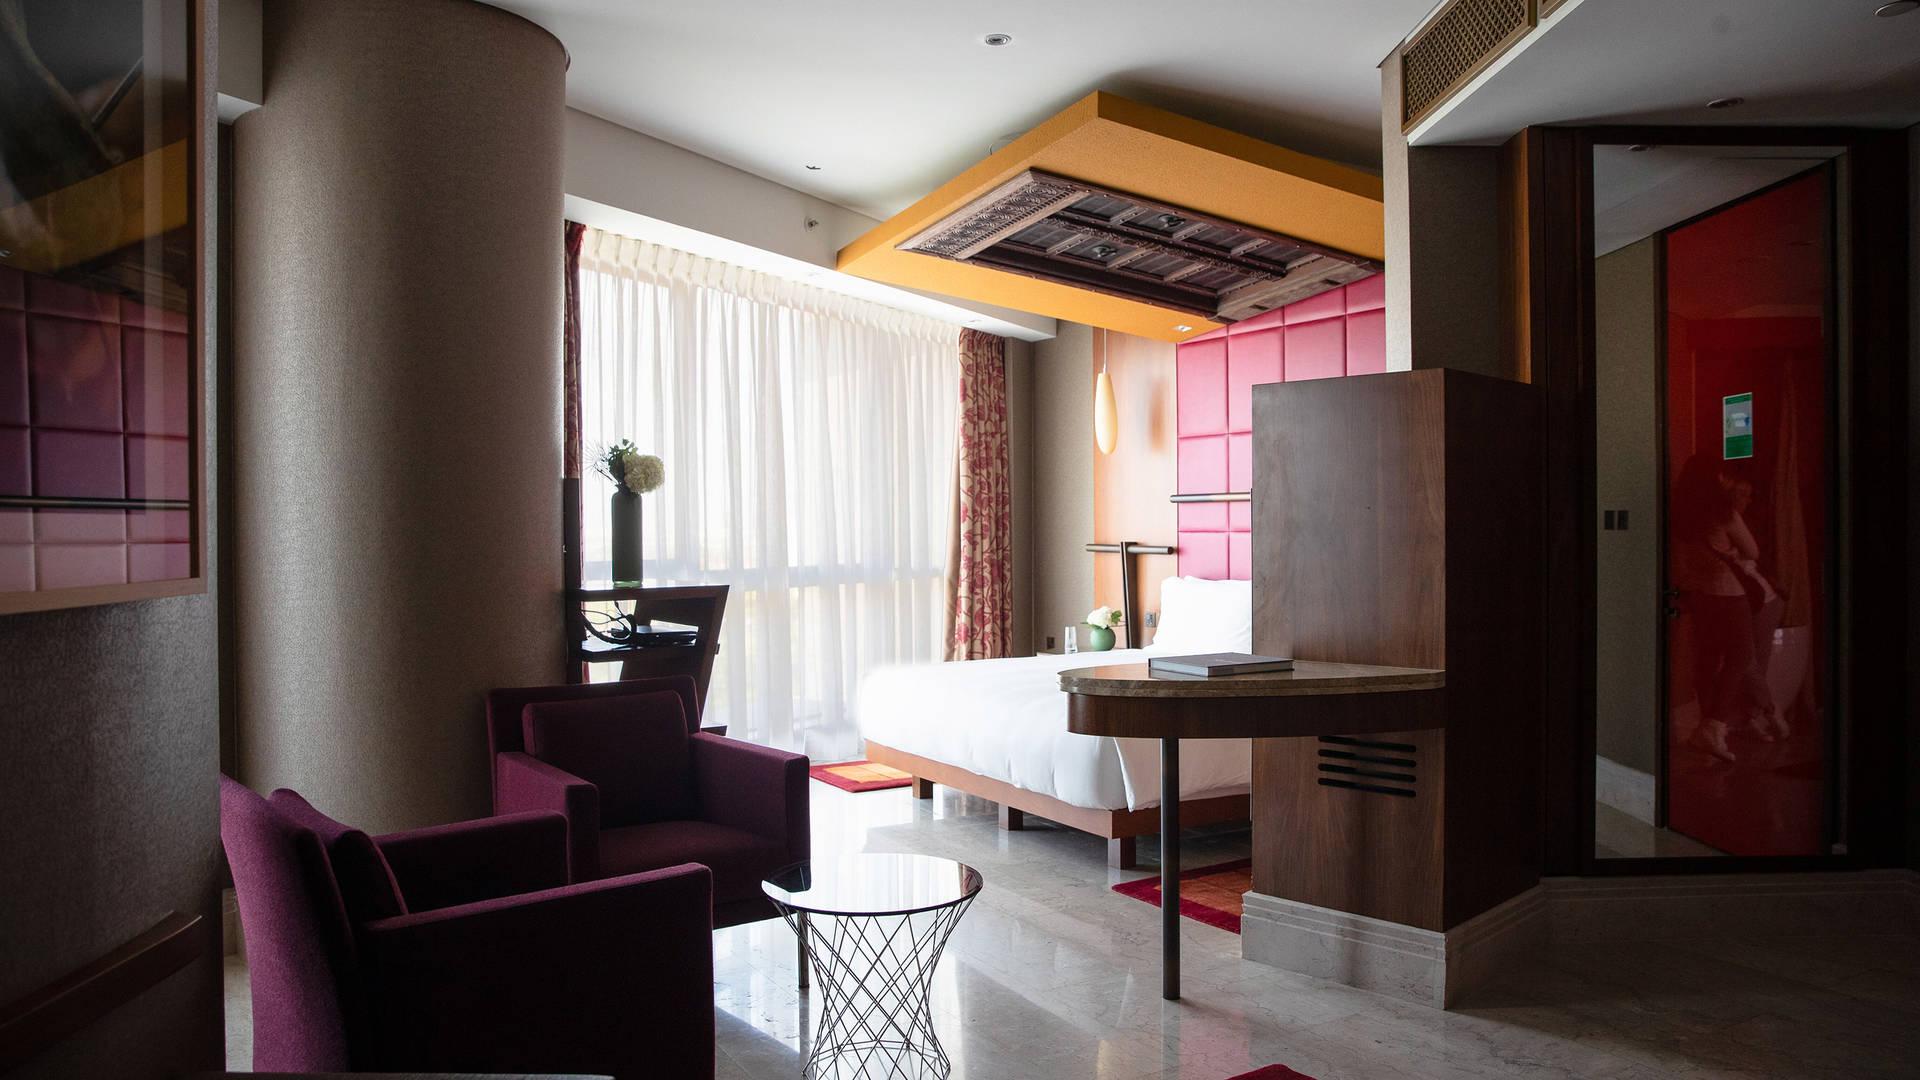 Duplex-Suite-Bedroom at Jumeirah-Creekside-Hotel